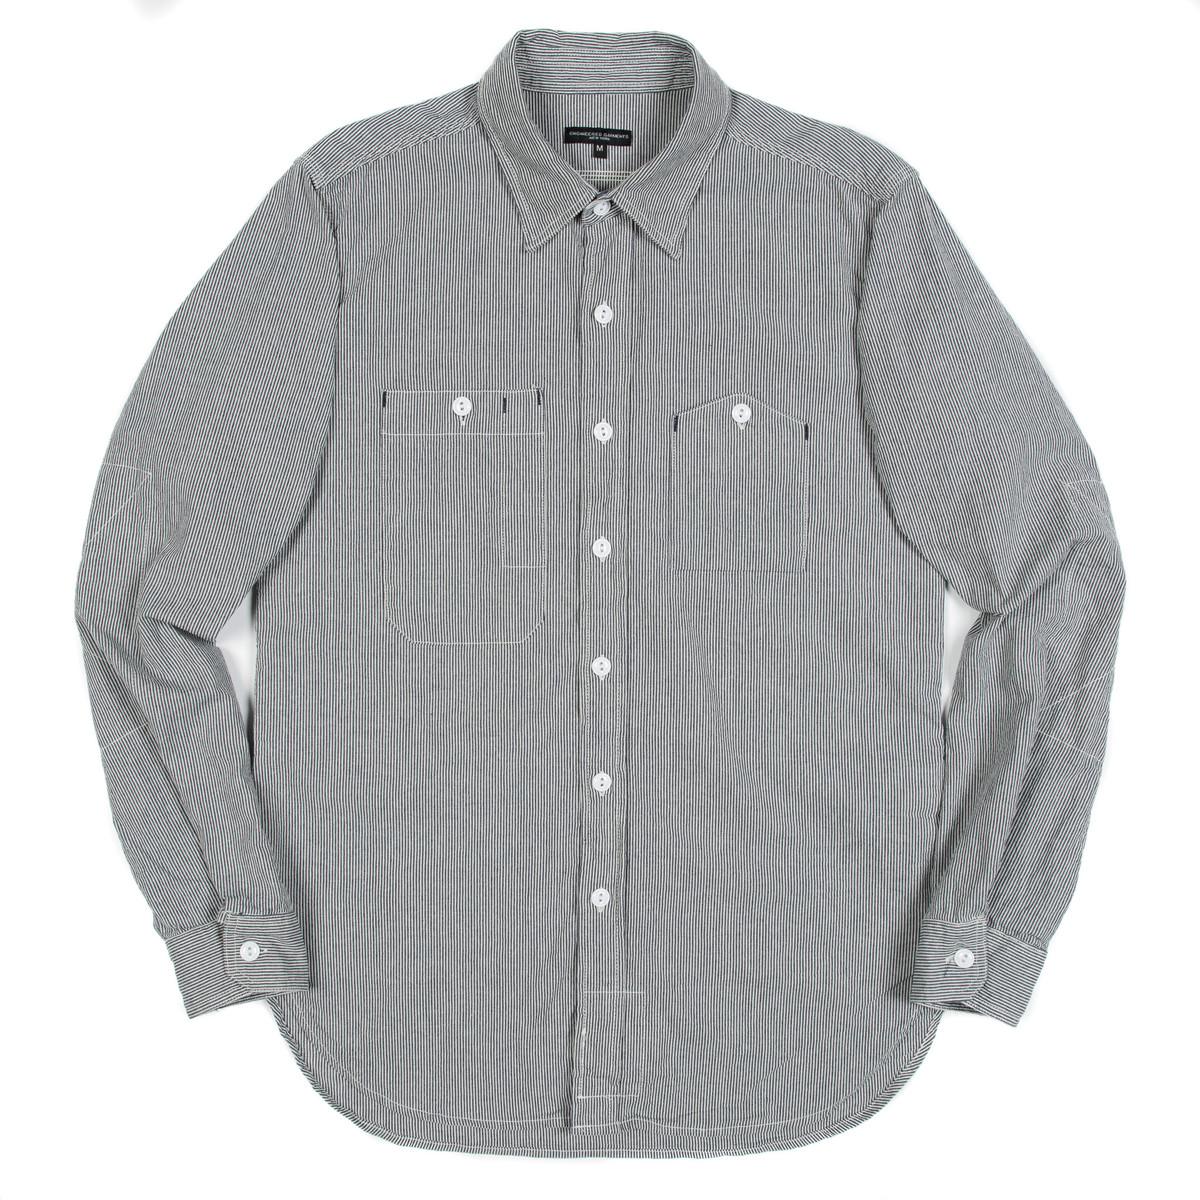 Engineered-Garments-Work-Shirt-Blue-Railroad-Stripe-20170418192051.jpg